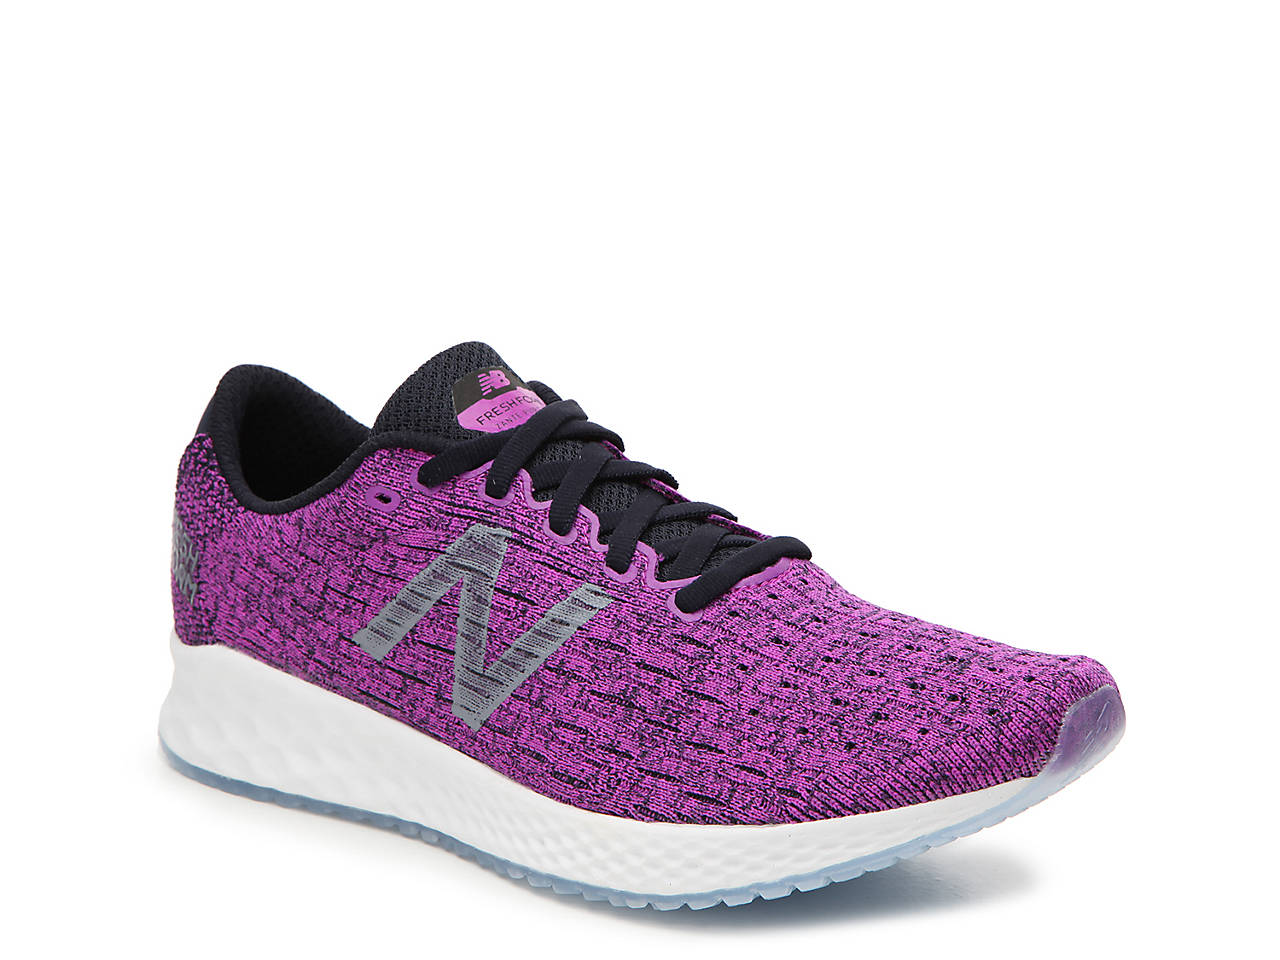 new balance fresh foam zante shoes